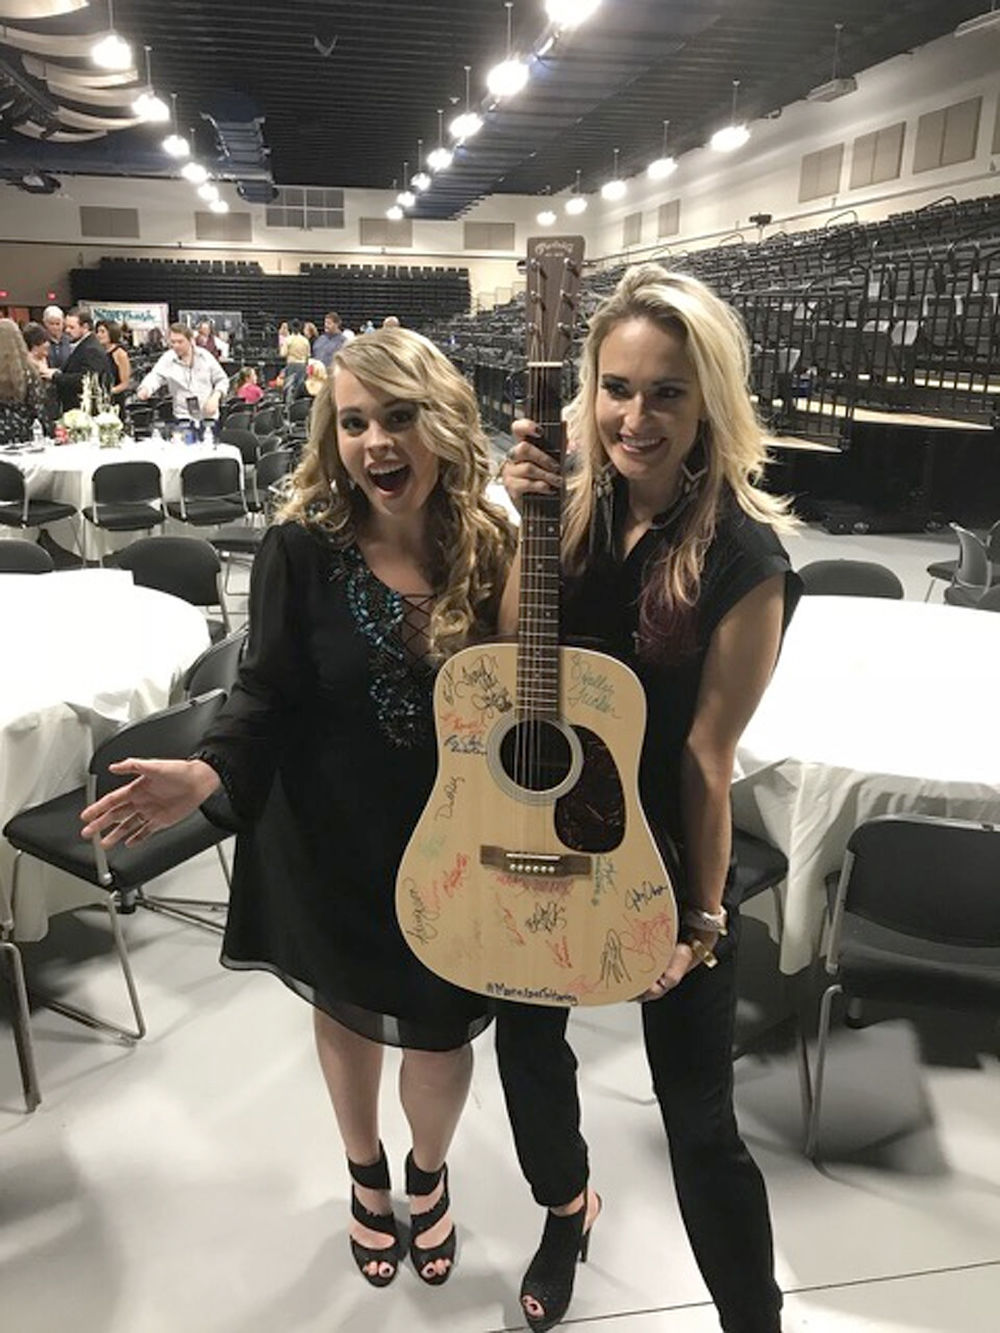 Holly Tucker and Bri Bagwell guitar